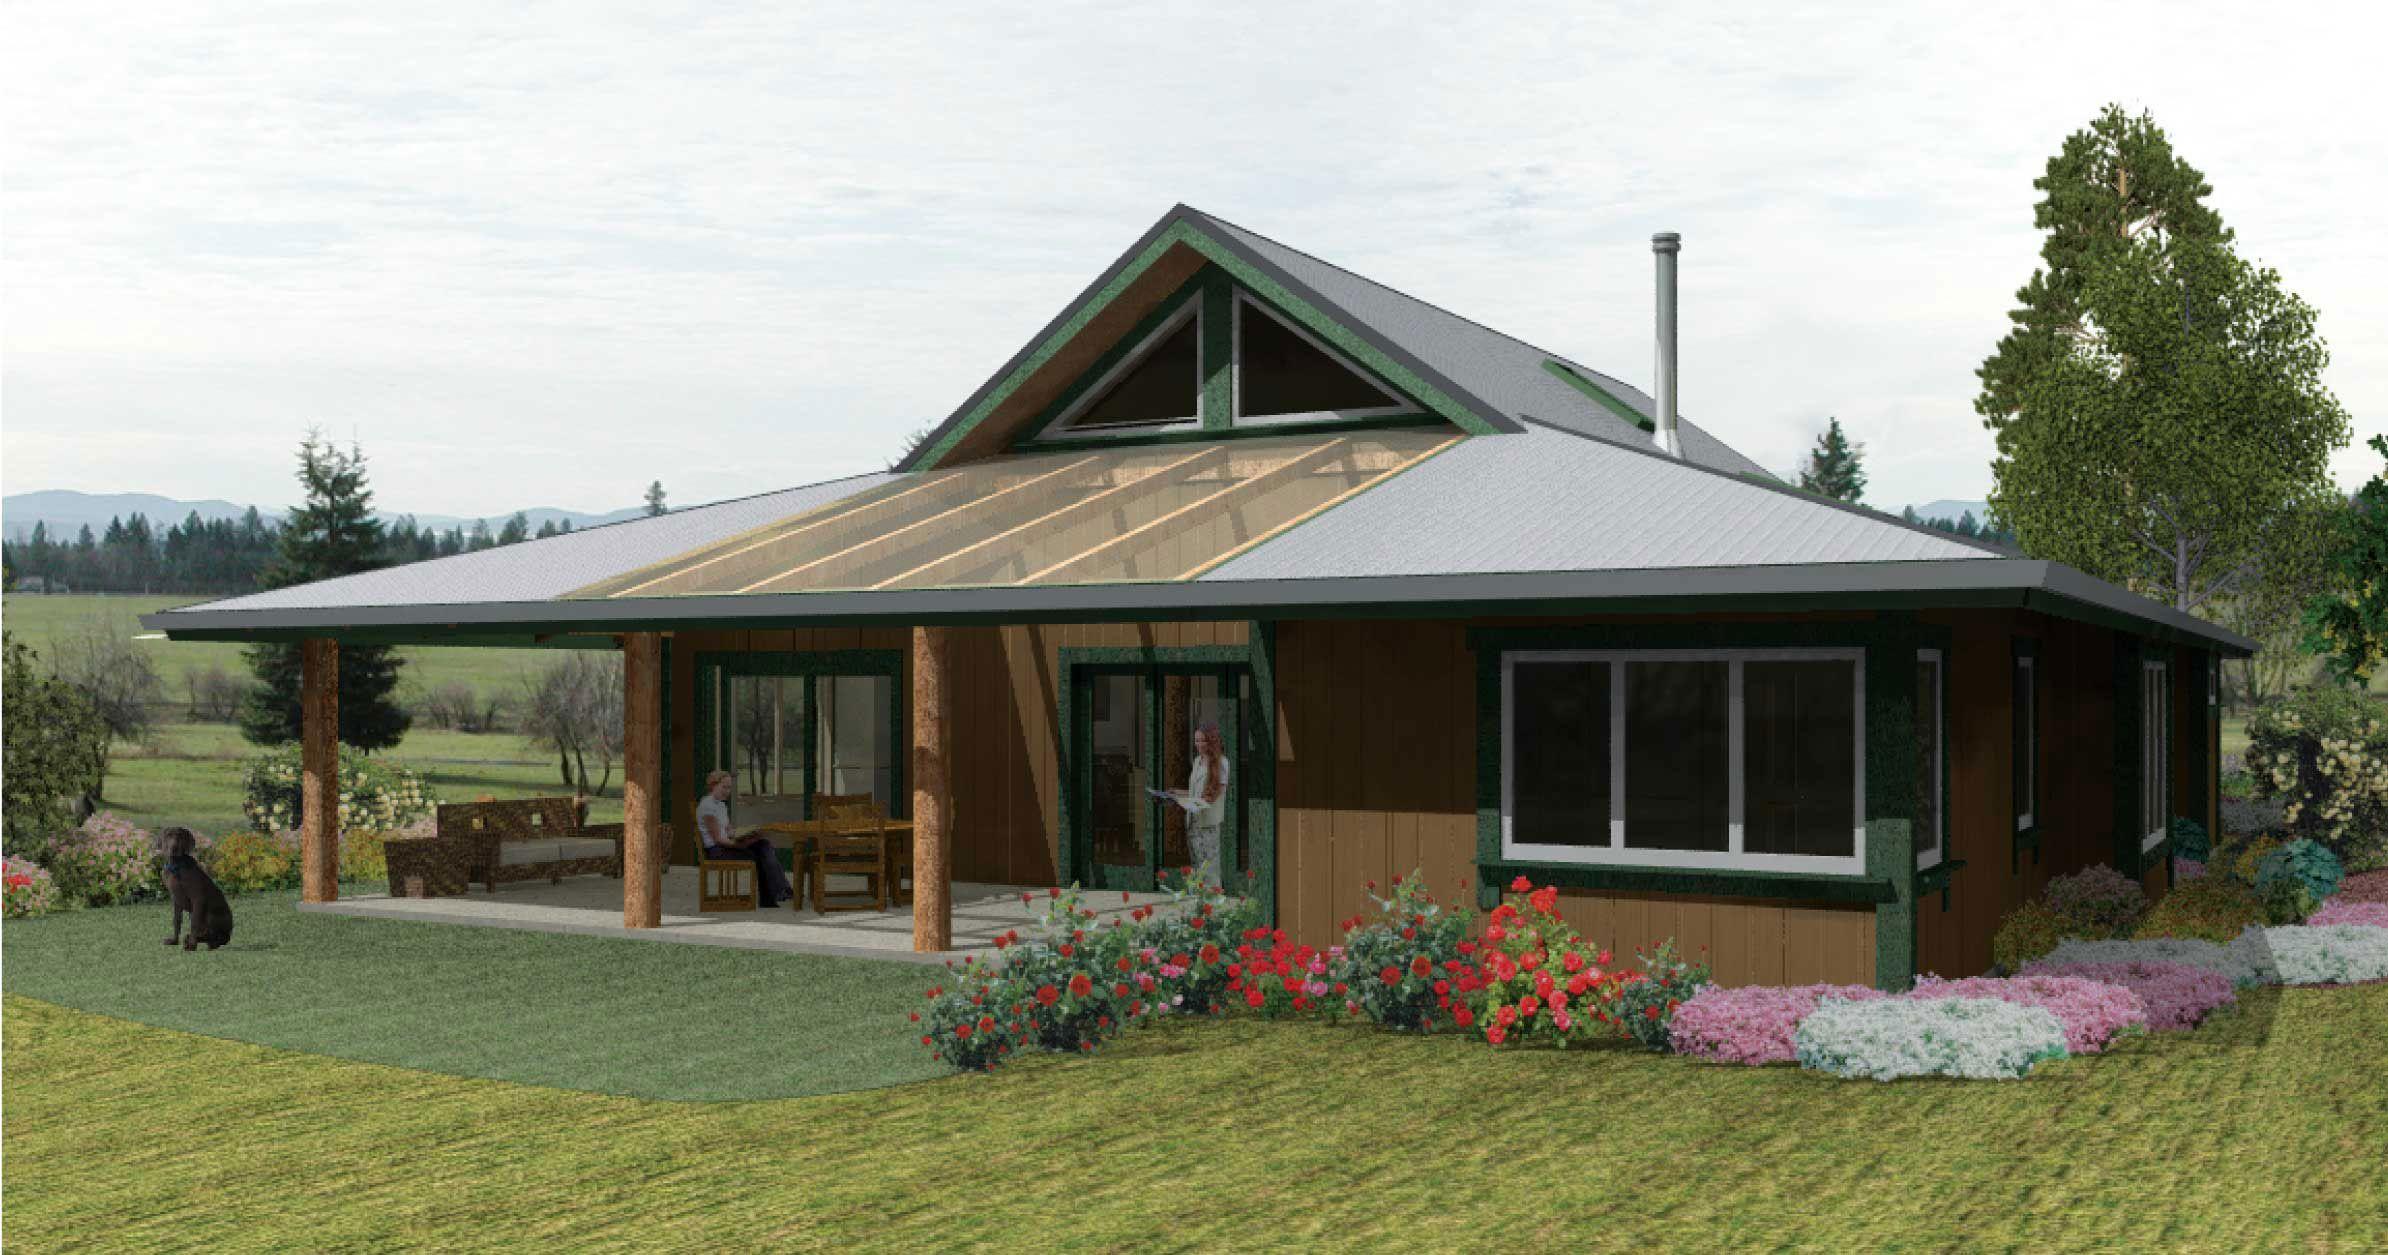 Pive Solar Design Basics - Green Homes | Home ideas | Country ... on modern farmhouse exterior house designs, farm house floor plans and designs, farmhouse home designs, best modern farm house designs,